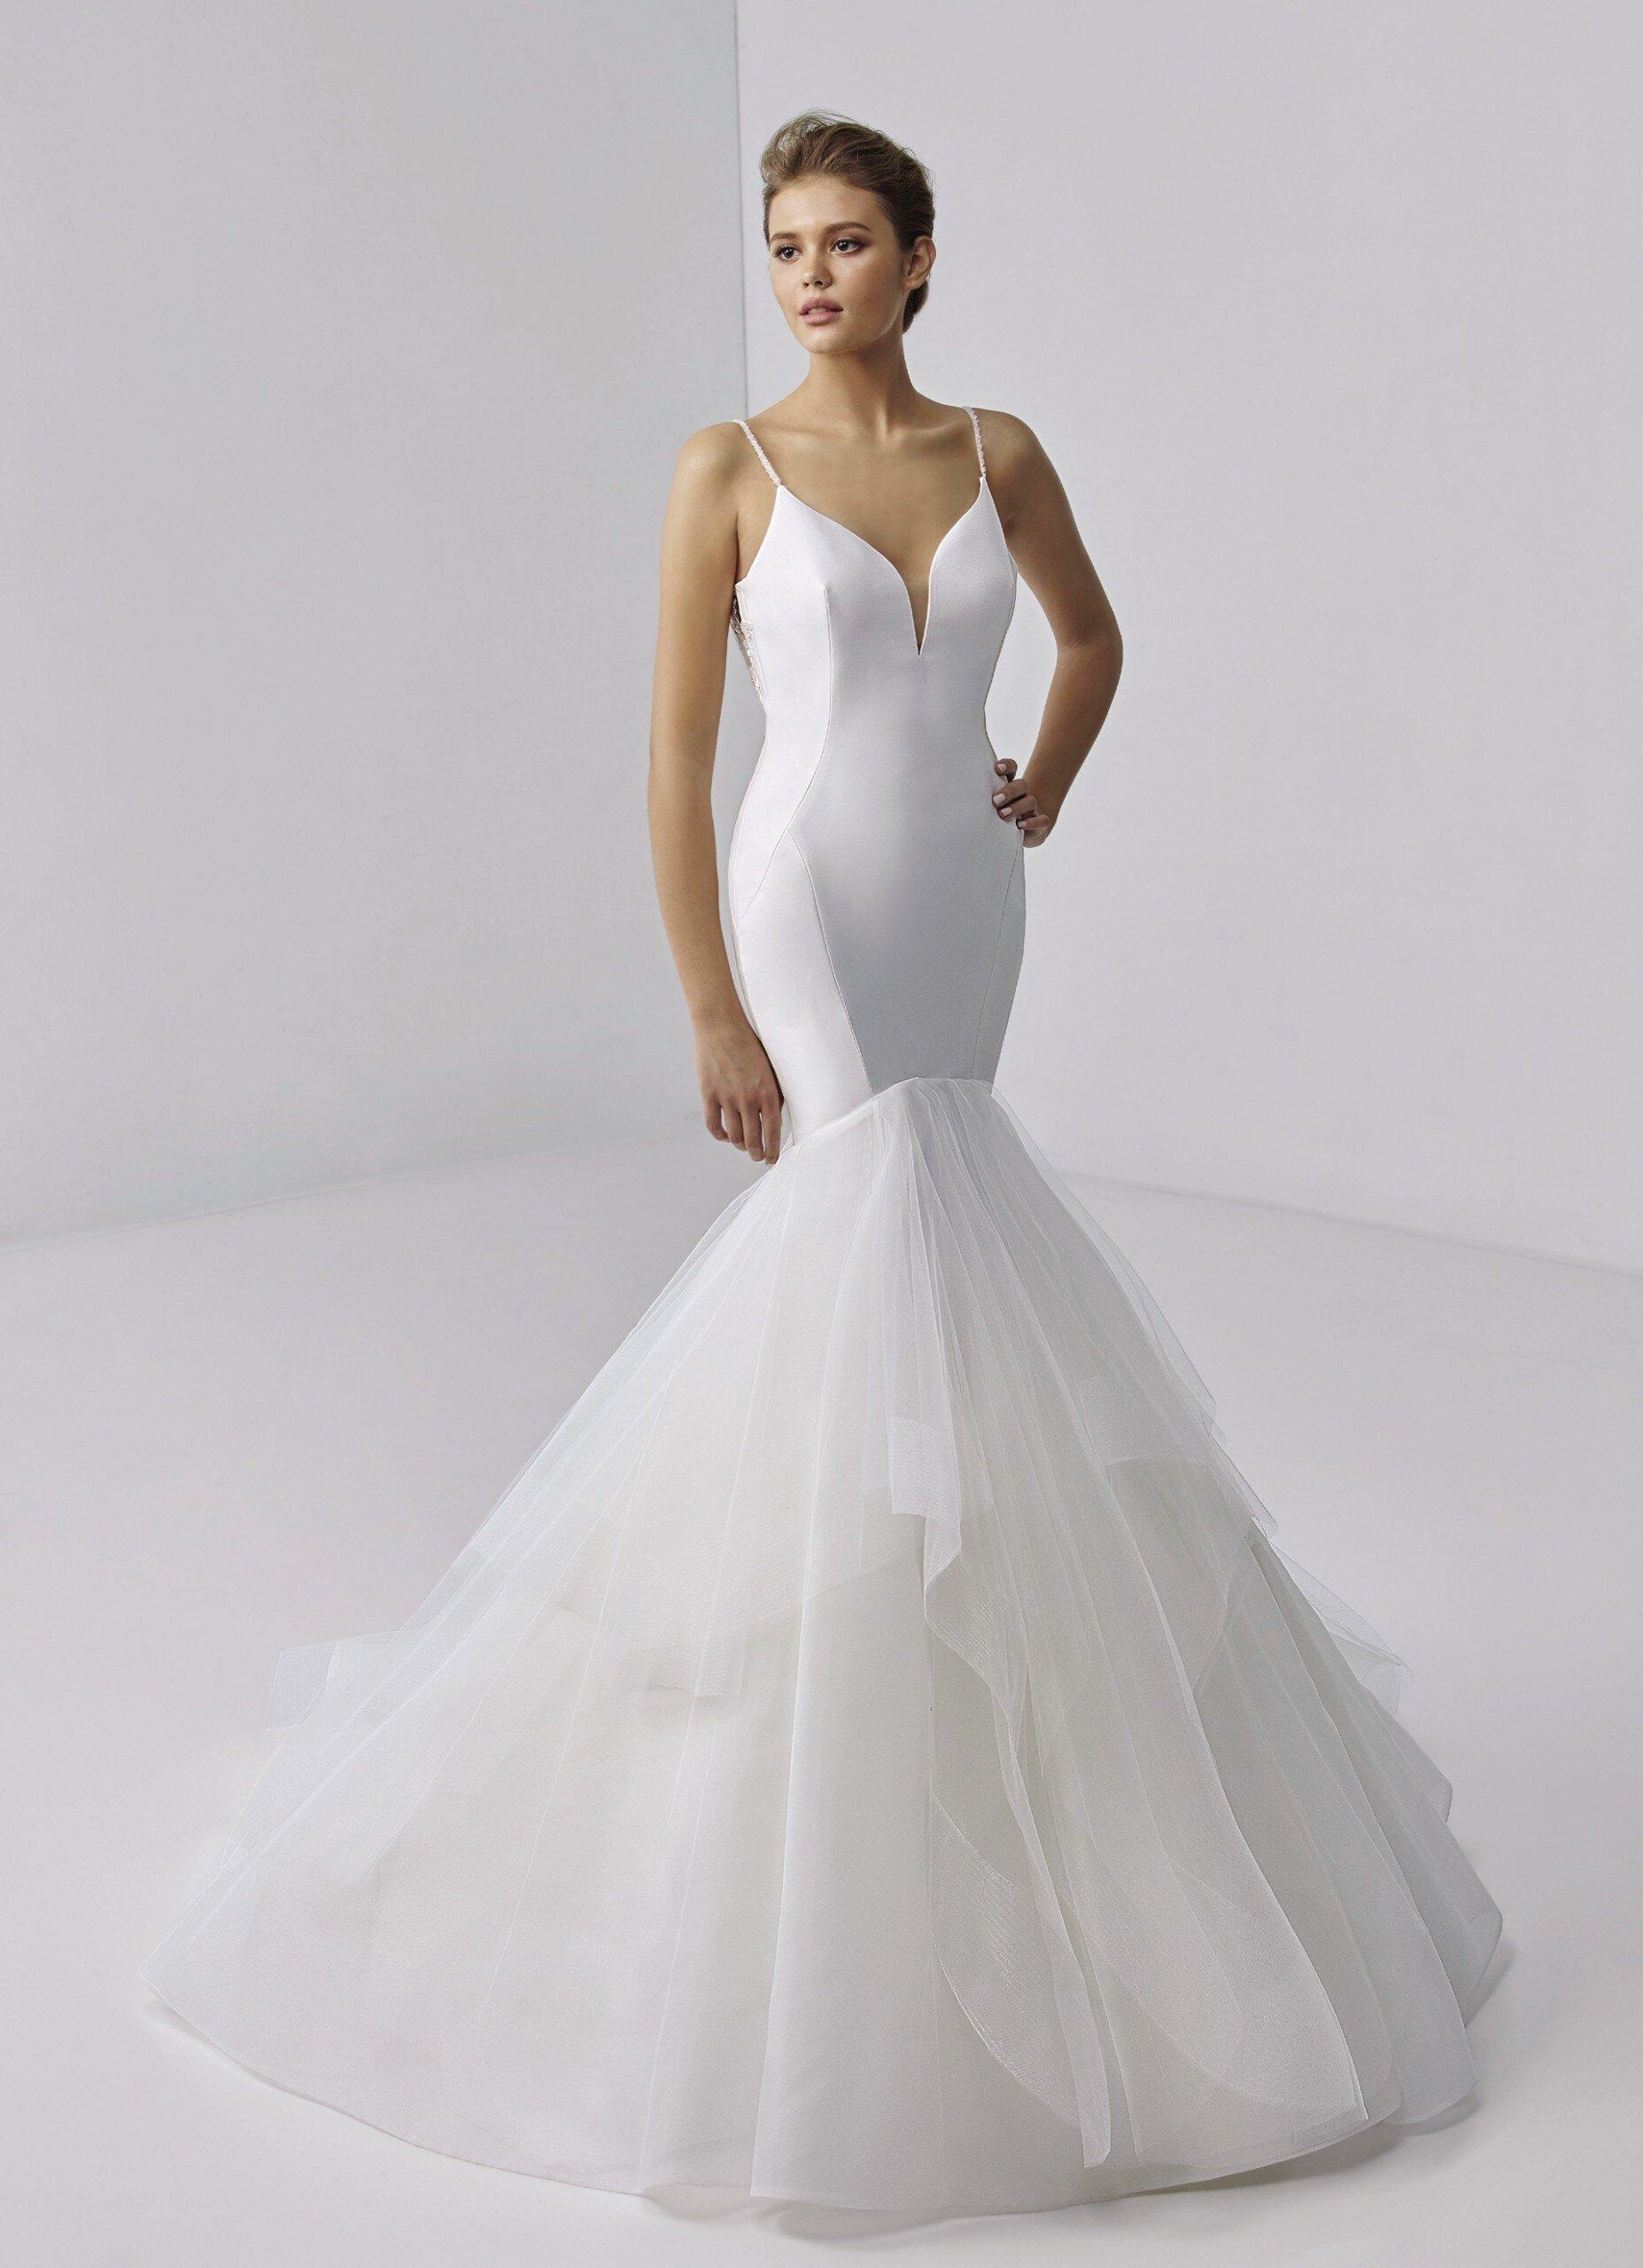 Etoile Brautmode Kollektion 2021 Modell Brigitte